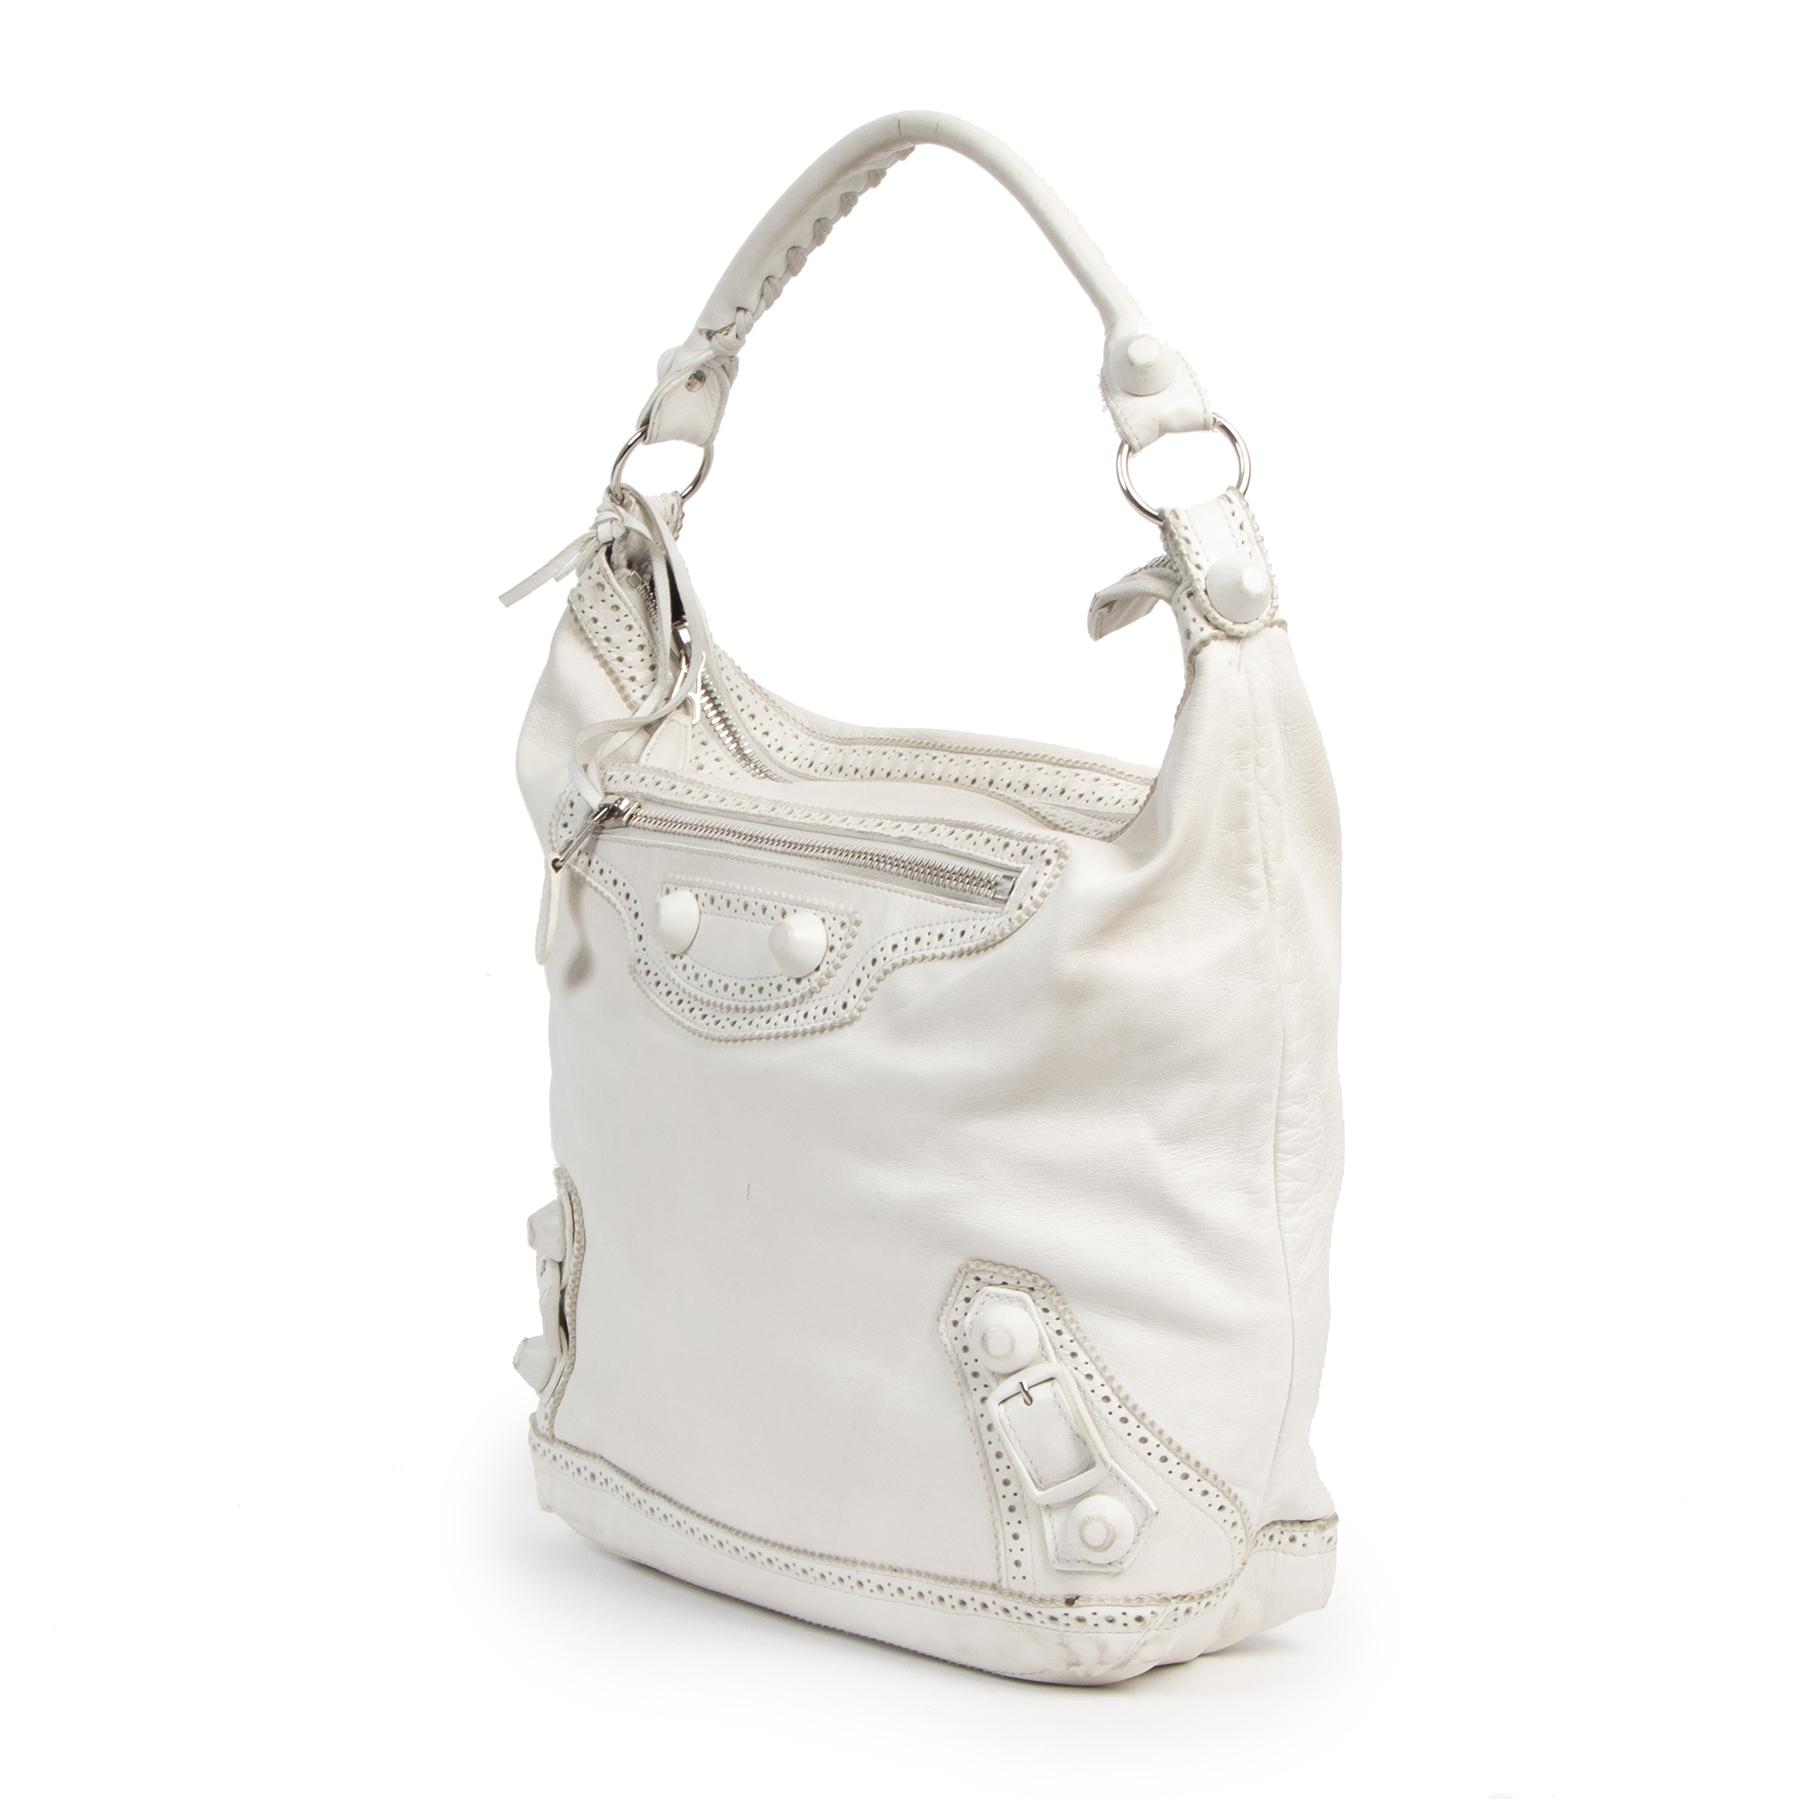 Authentic Secondhand Balenciaga White Giant Day Bag juiste prijs veilig online shoppen luxe merken webshop winkelen Antwerpen België mode fashion